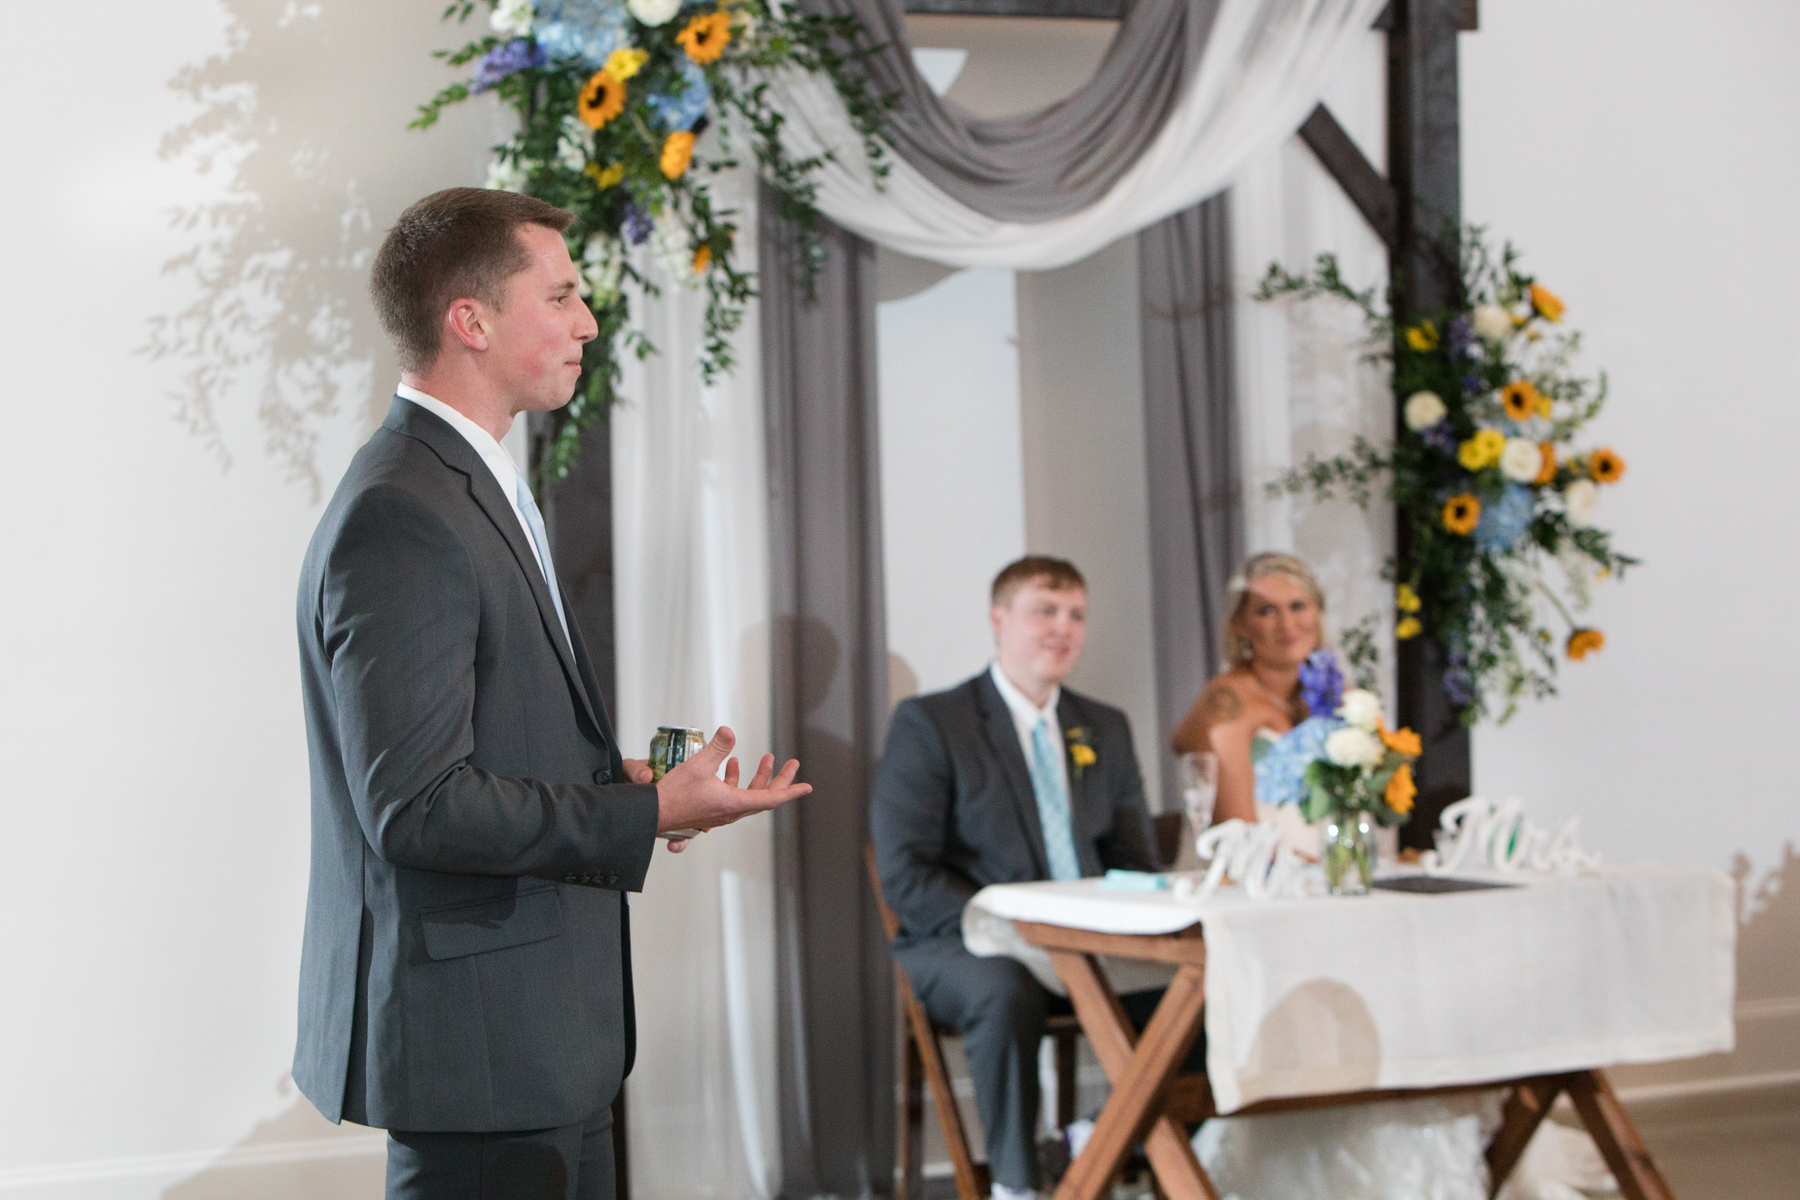 The-venue-at-white-oak-farms-wedding-nashville-wedding-photographers-0325.jpg